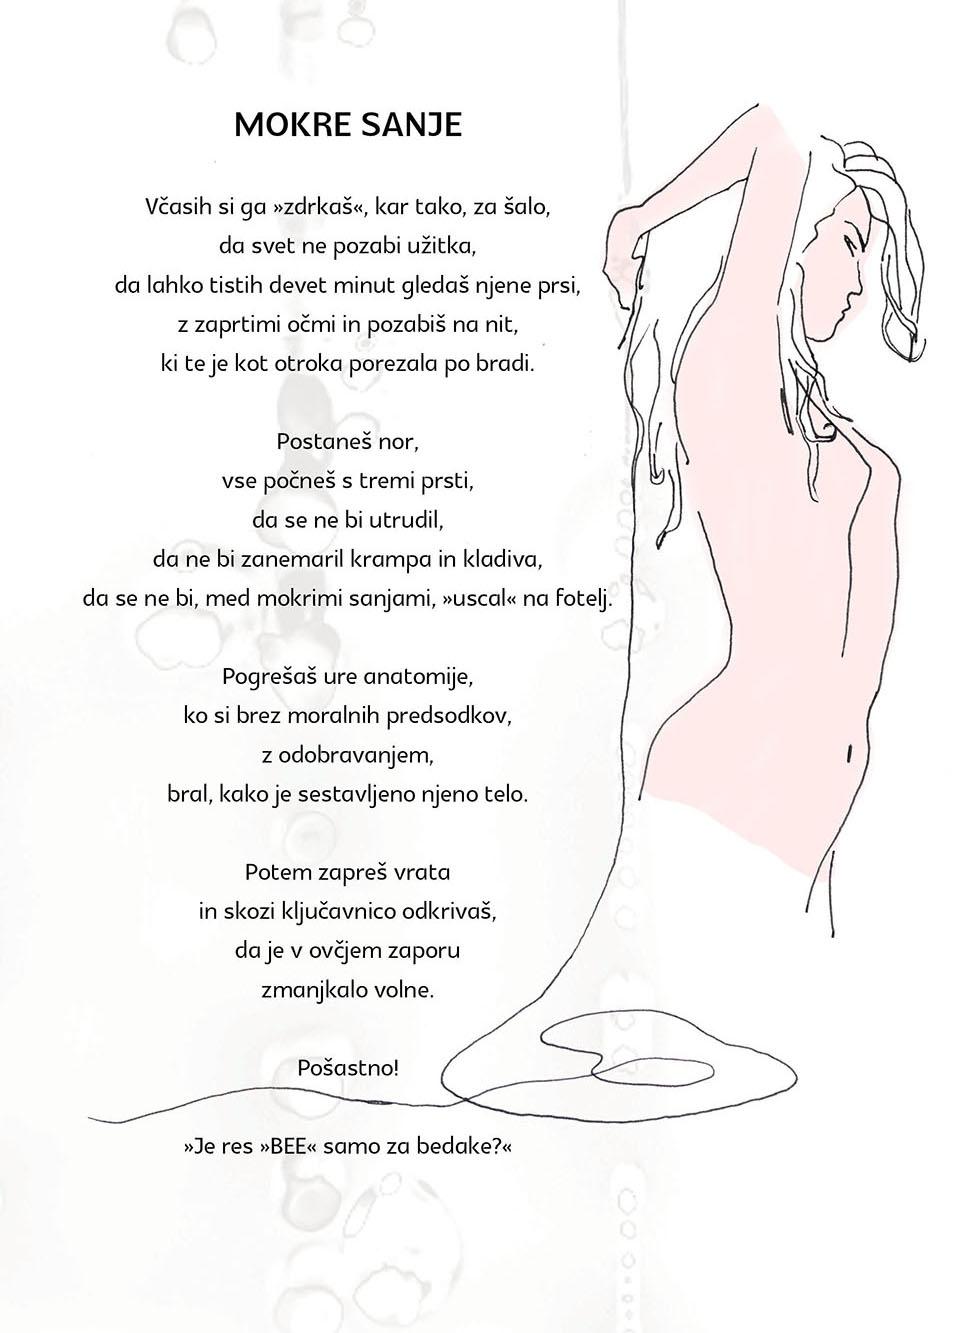 Mokre sanje_Maja Milosevic